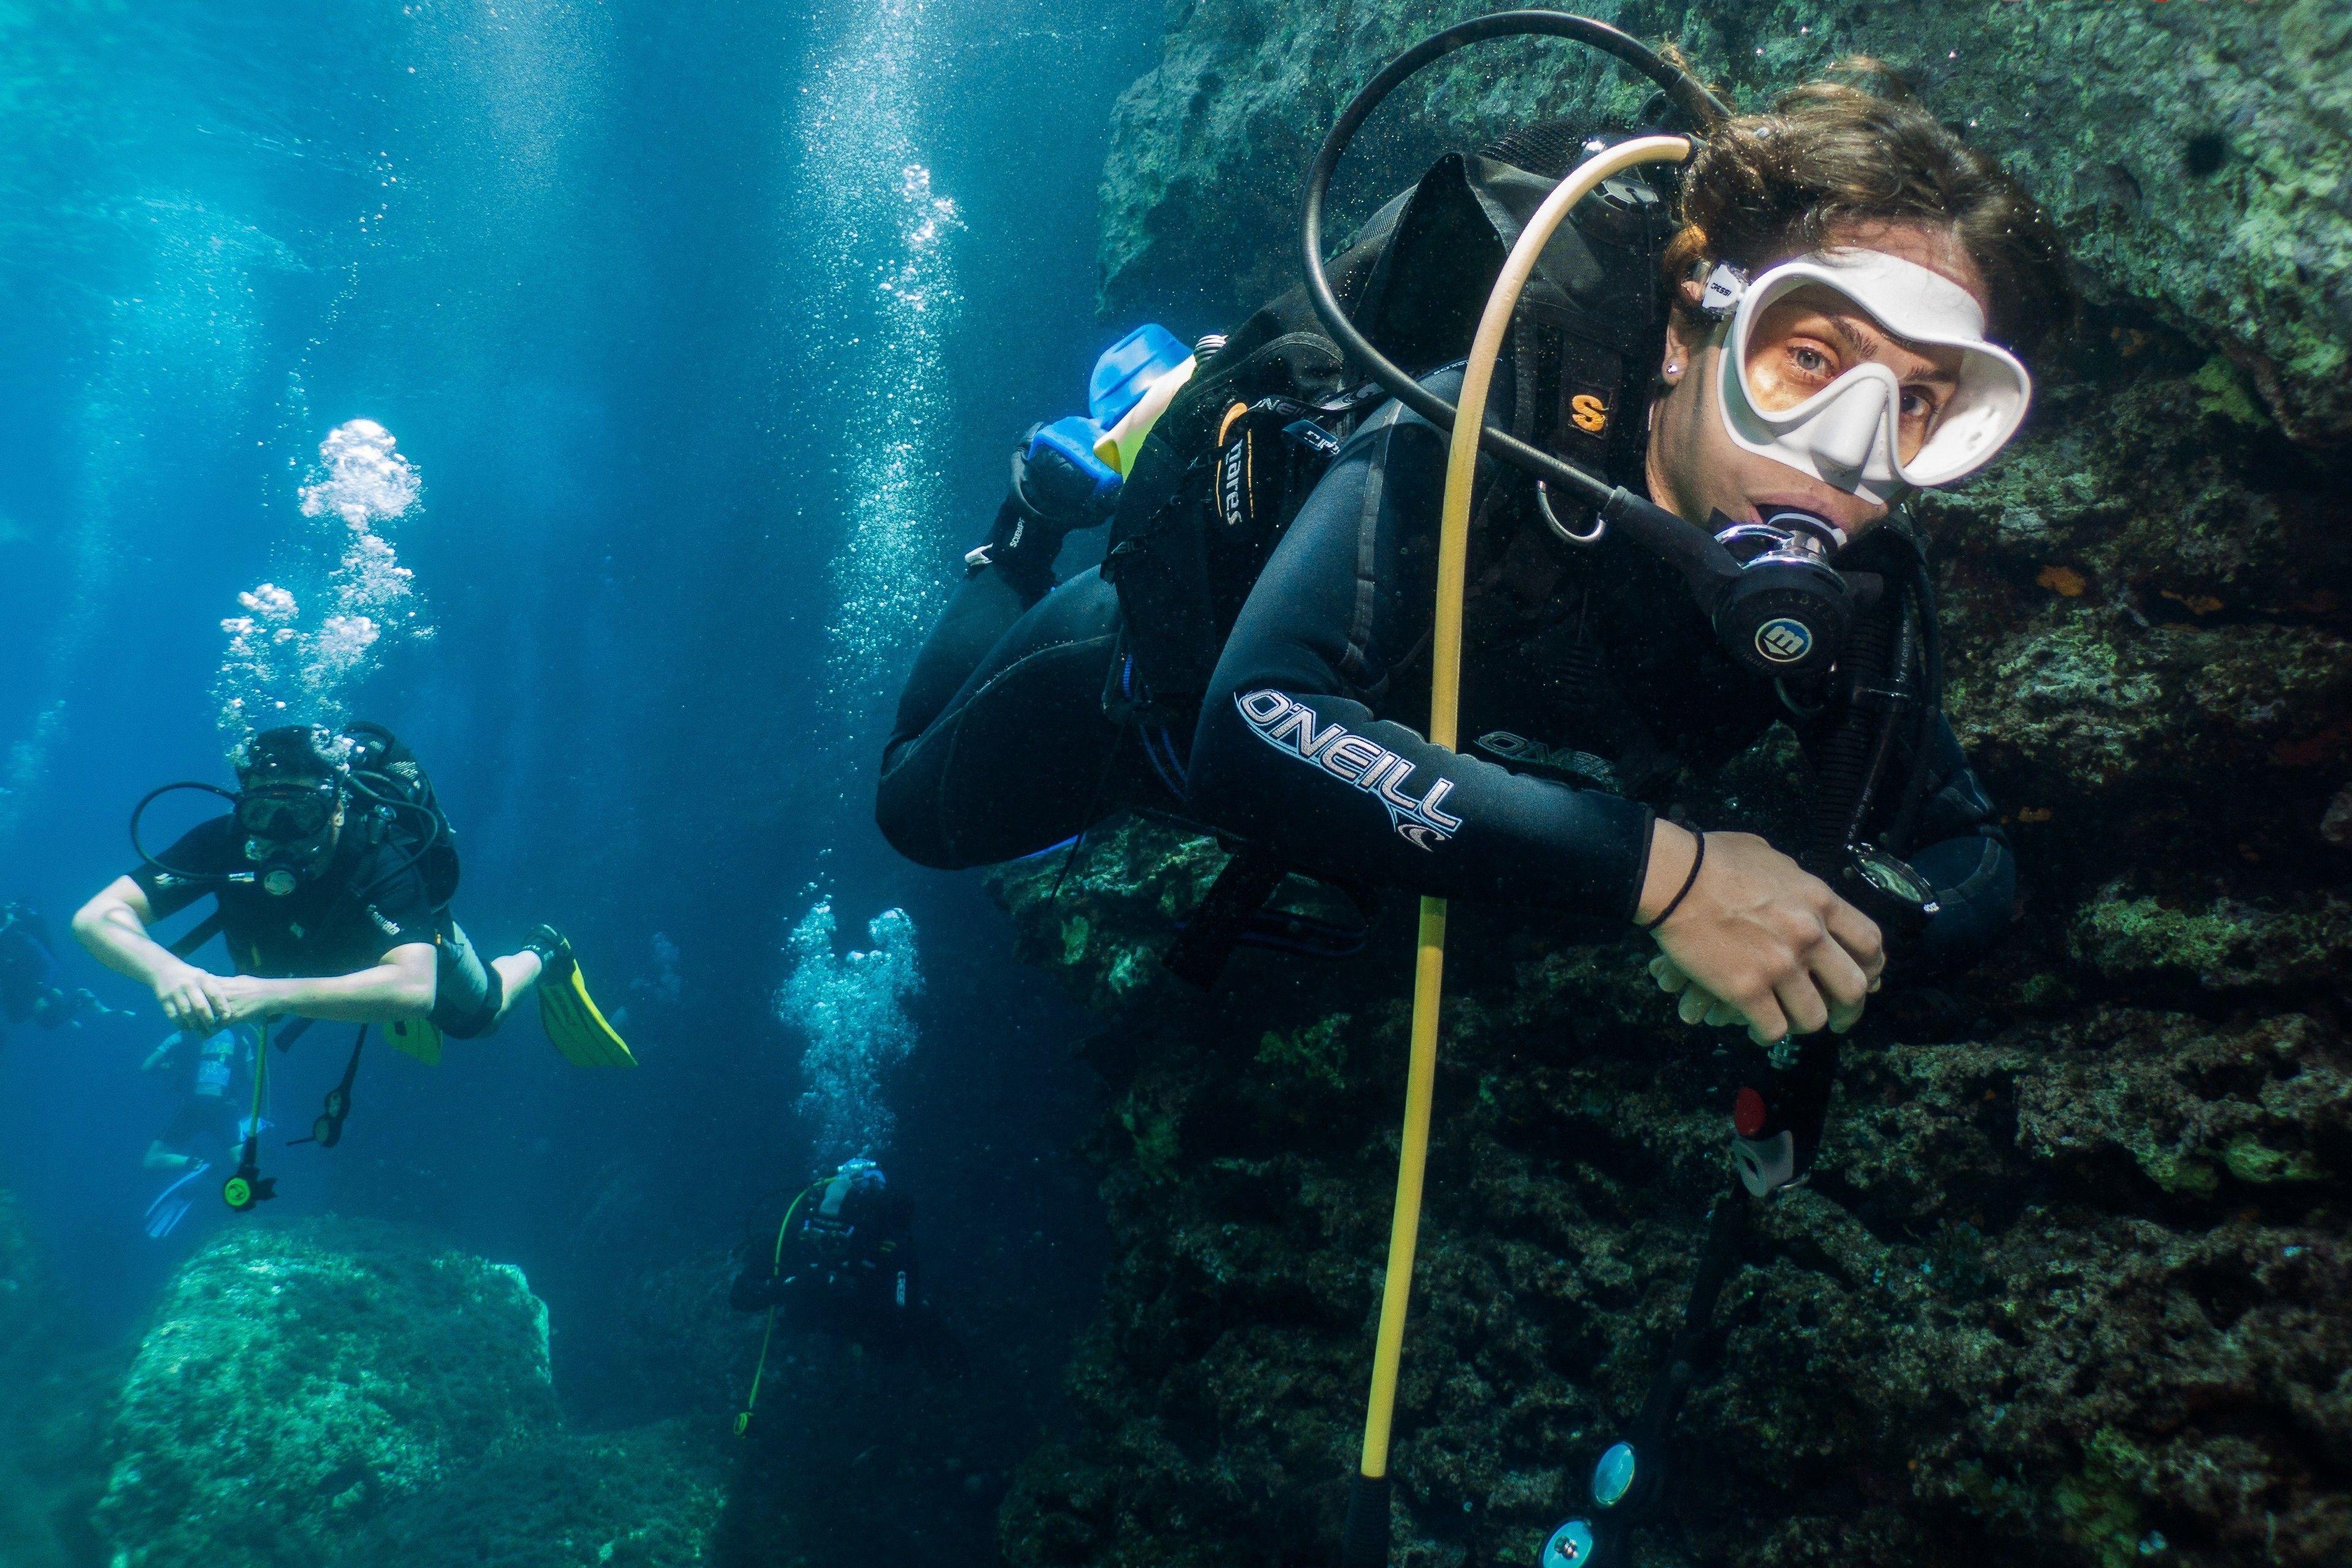 SCUBA divers swim underwater